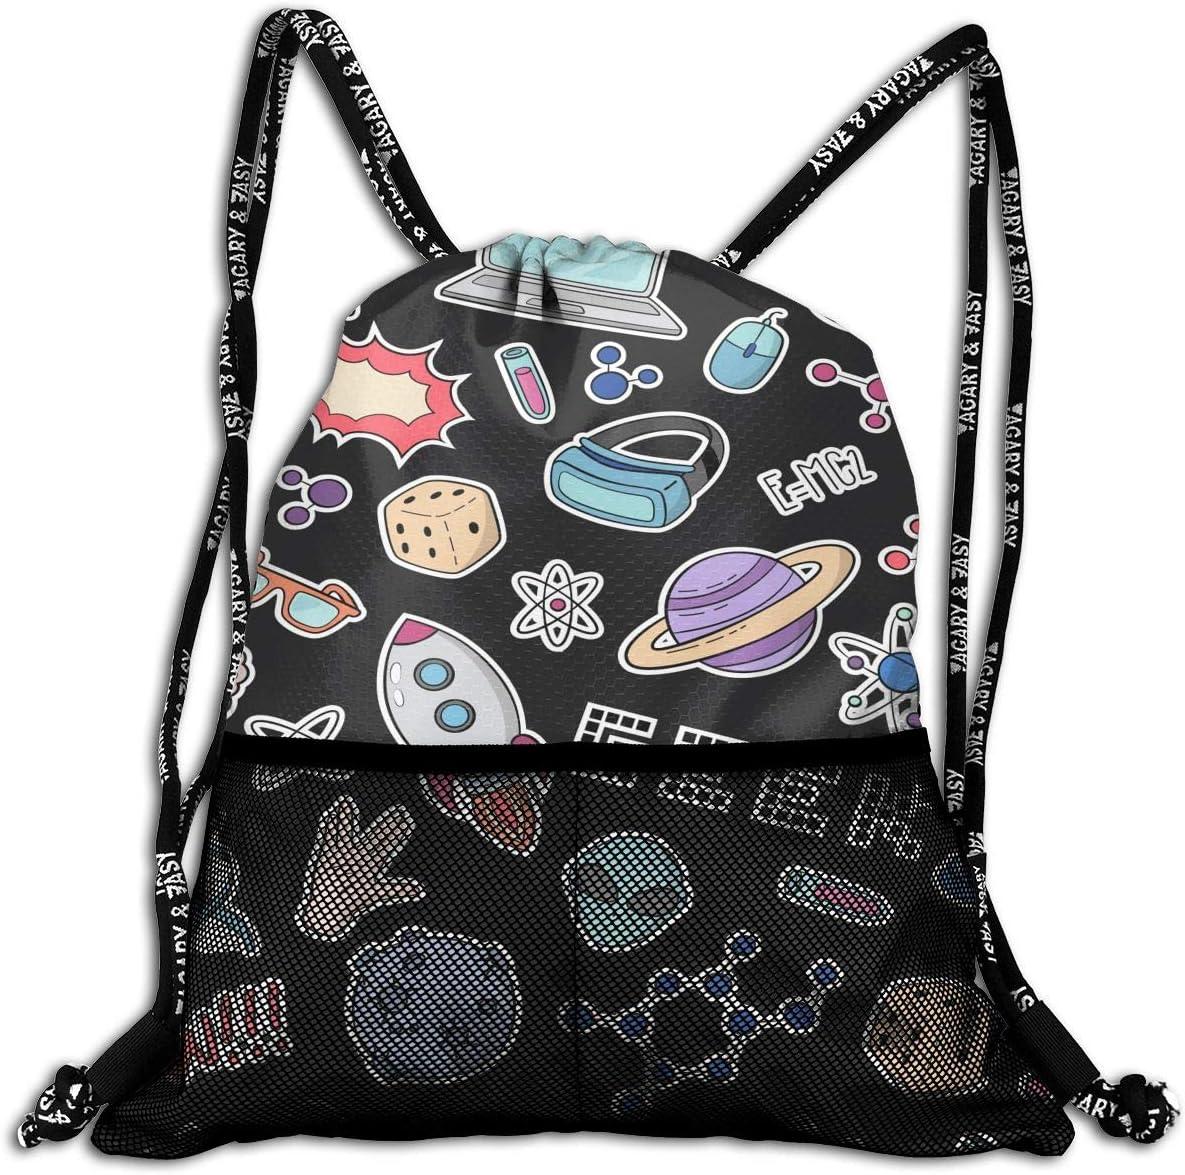 Drawstring Backpack Social-media-icon Bags Knapsack For Hiking